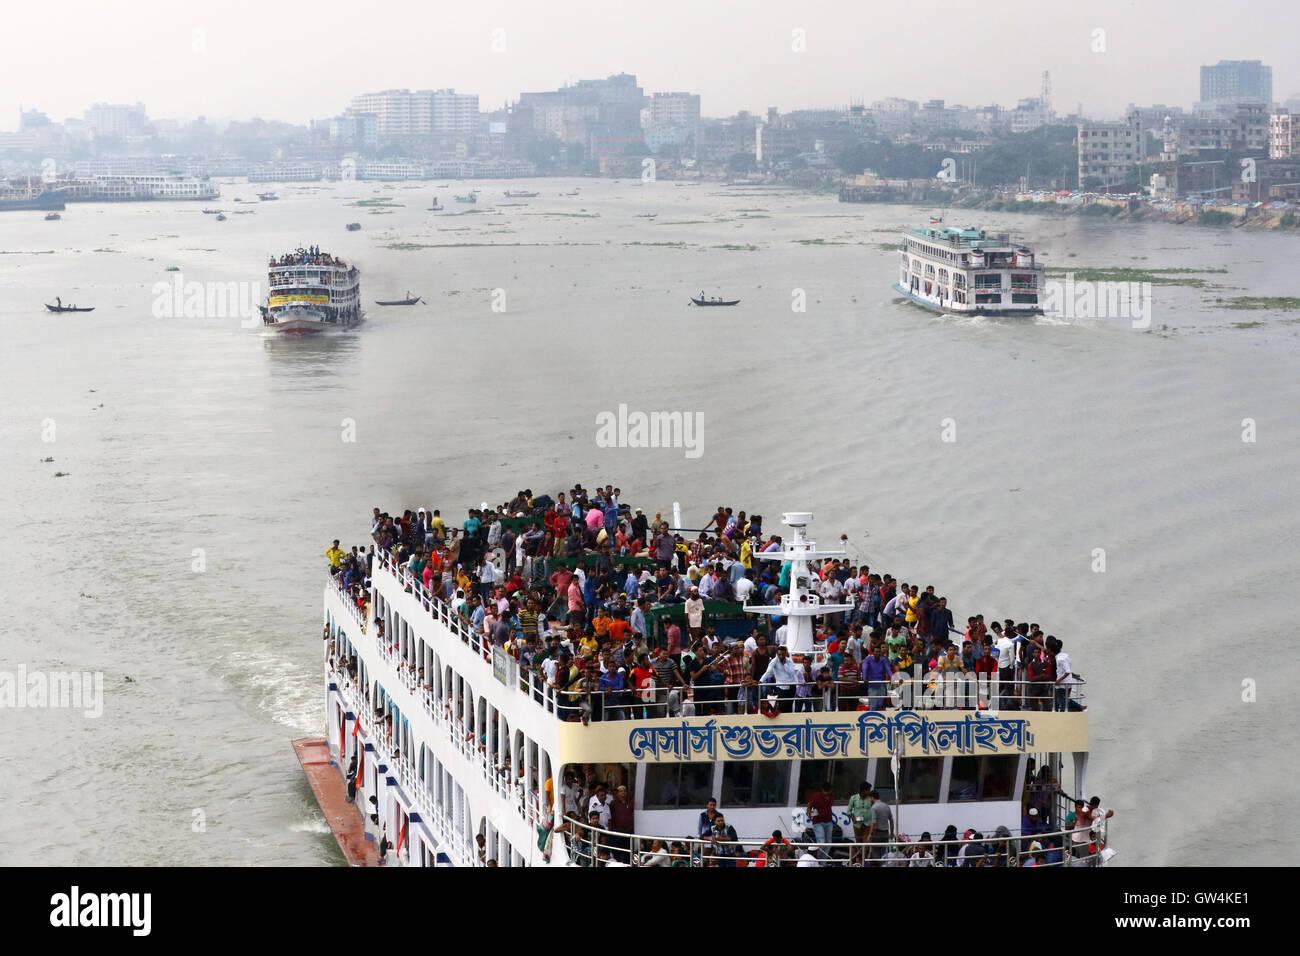 Dhaka, Bangladesh. 11th September, 2016. : Thousands of Bangladeshis cram ferries, as they rush home to be with - Stock Image